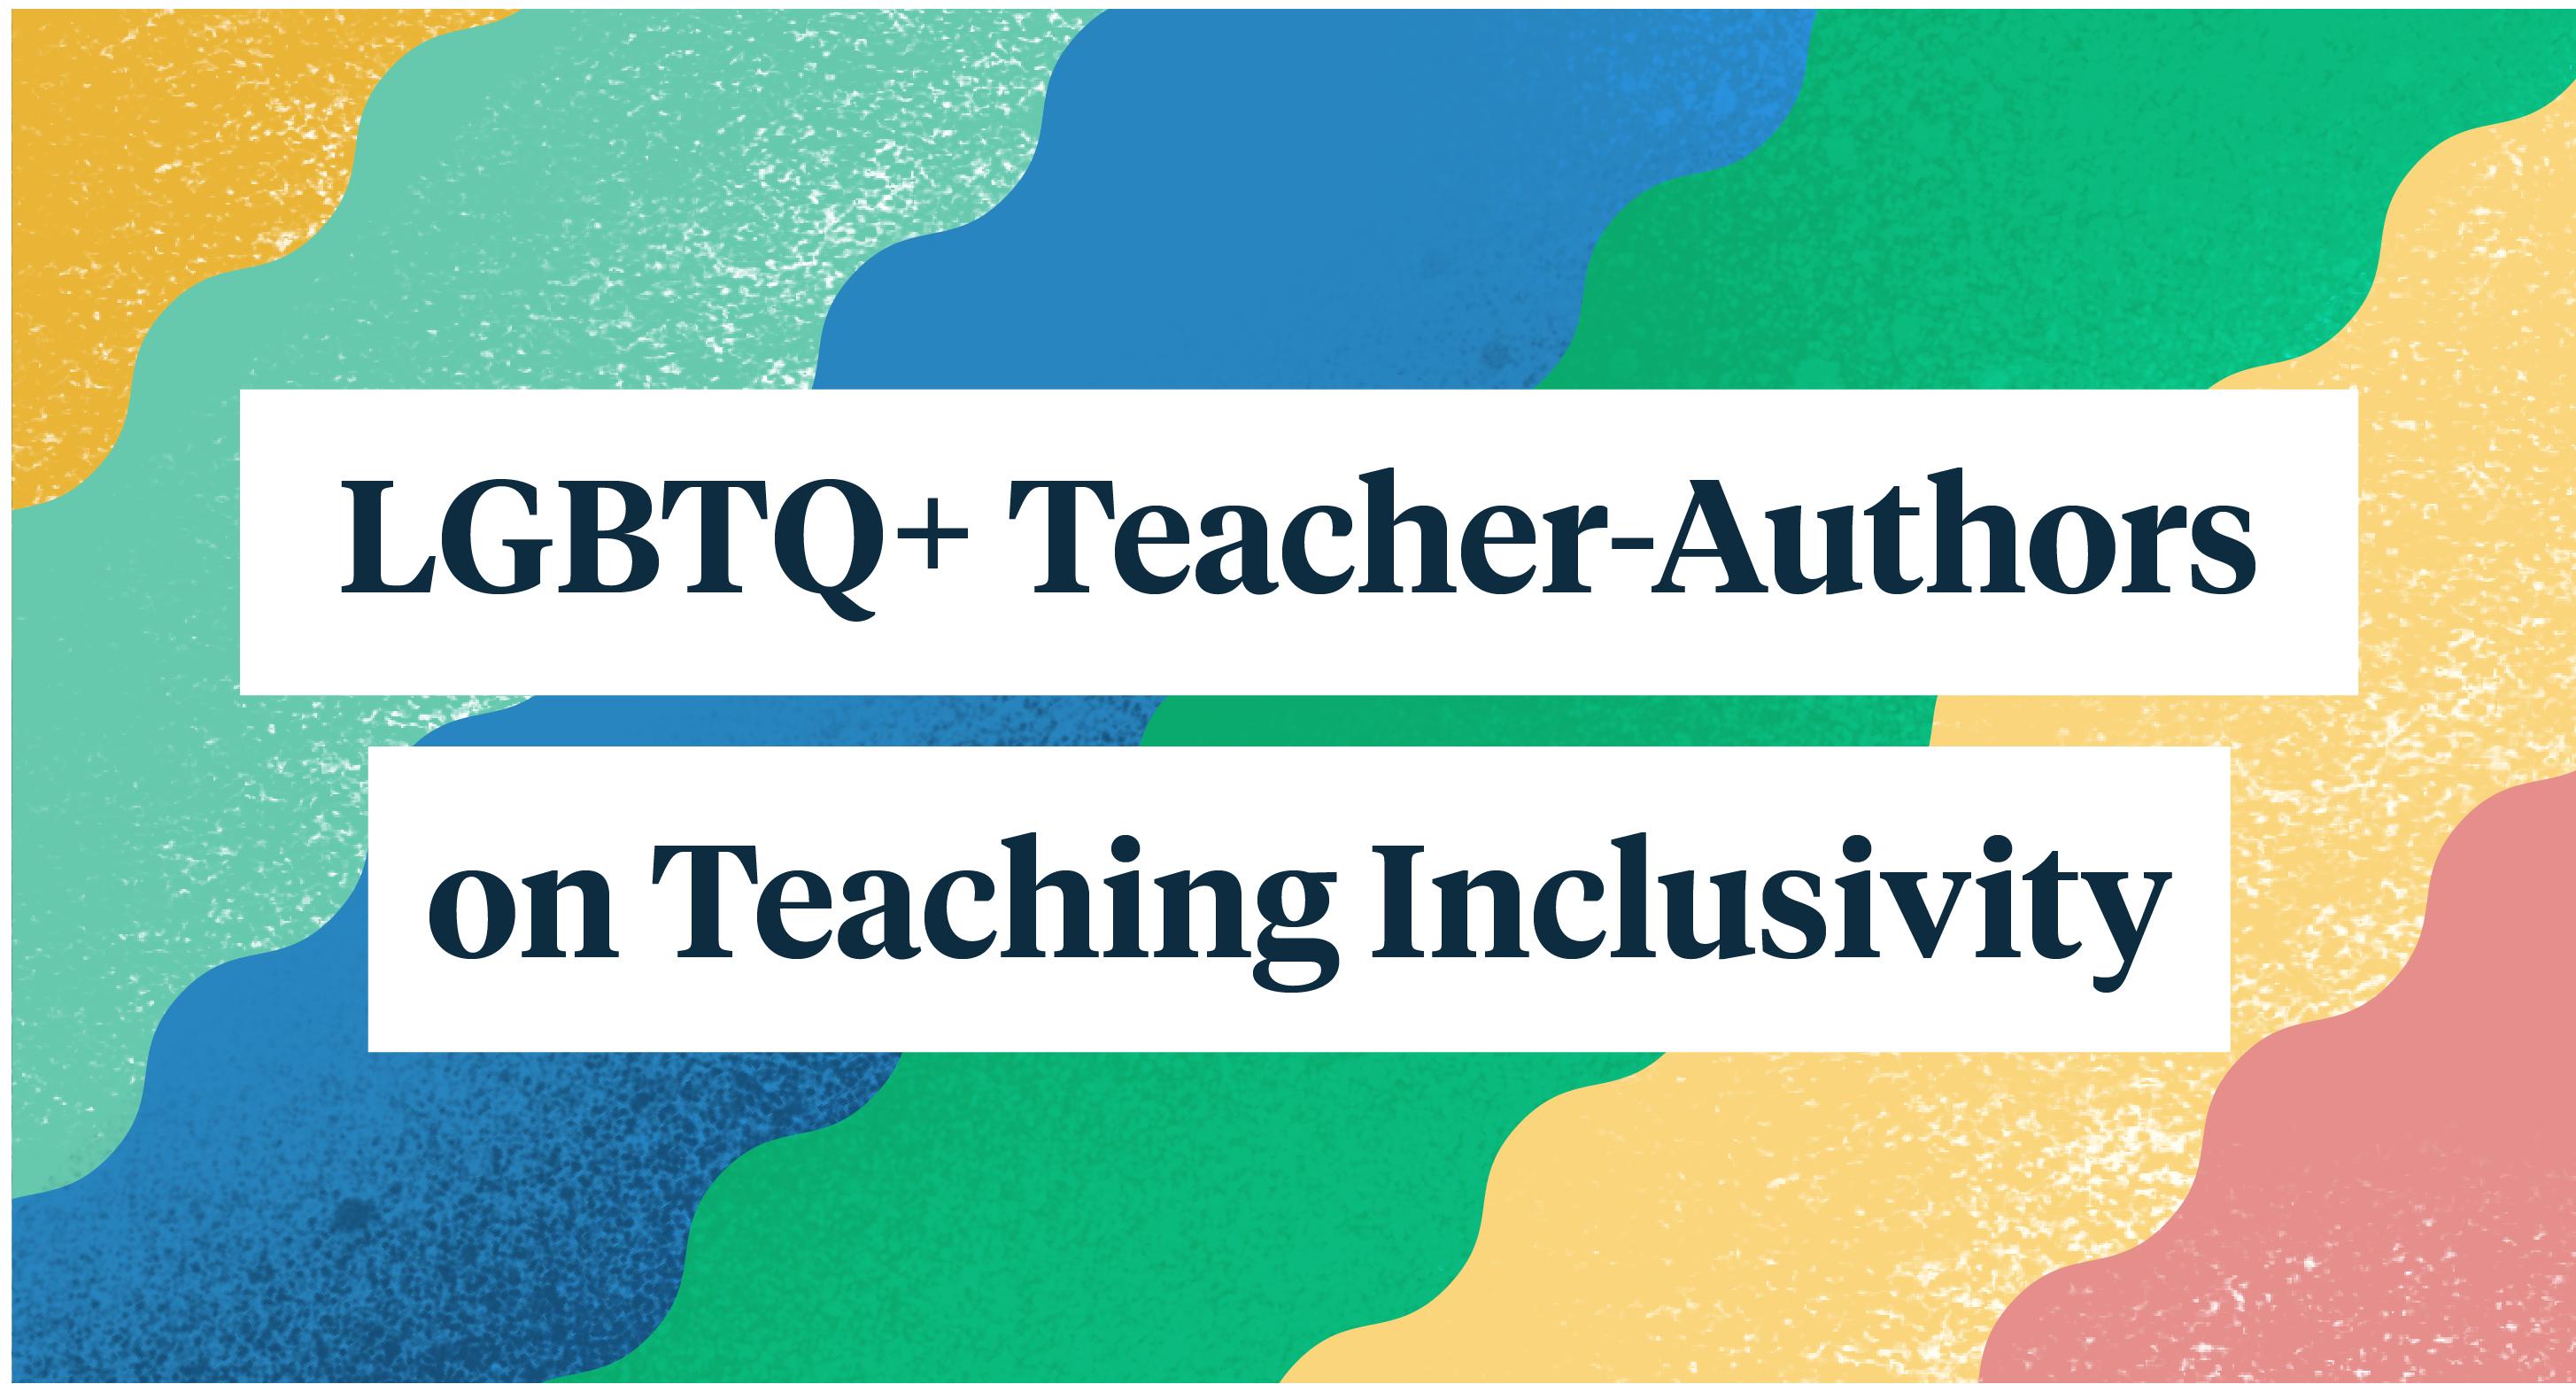 LGBTQ+ Teacher-Authors on Teaching Inclusivity